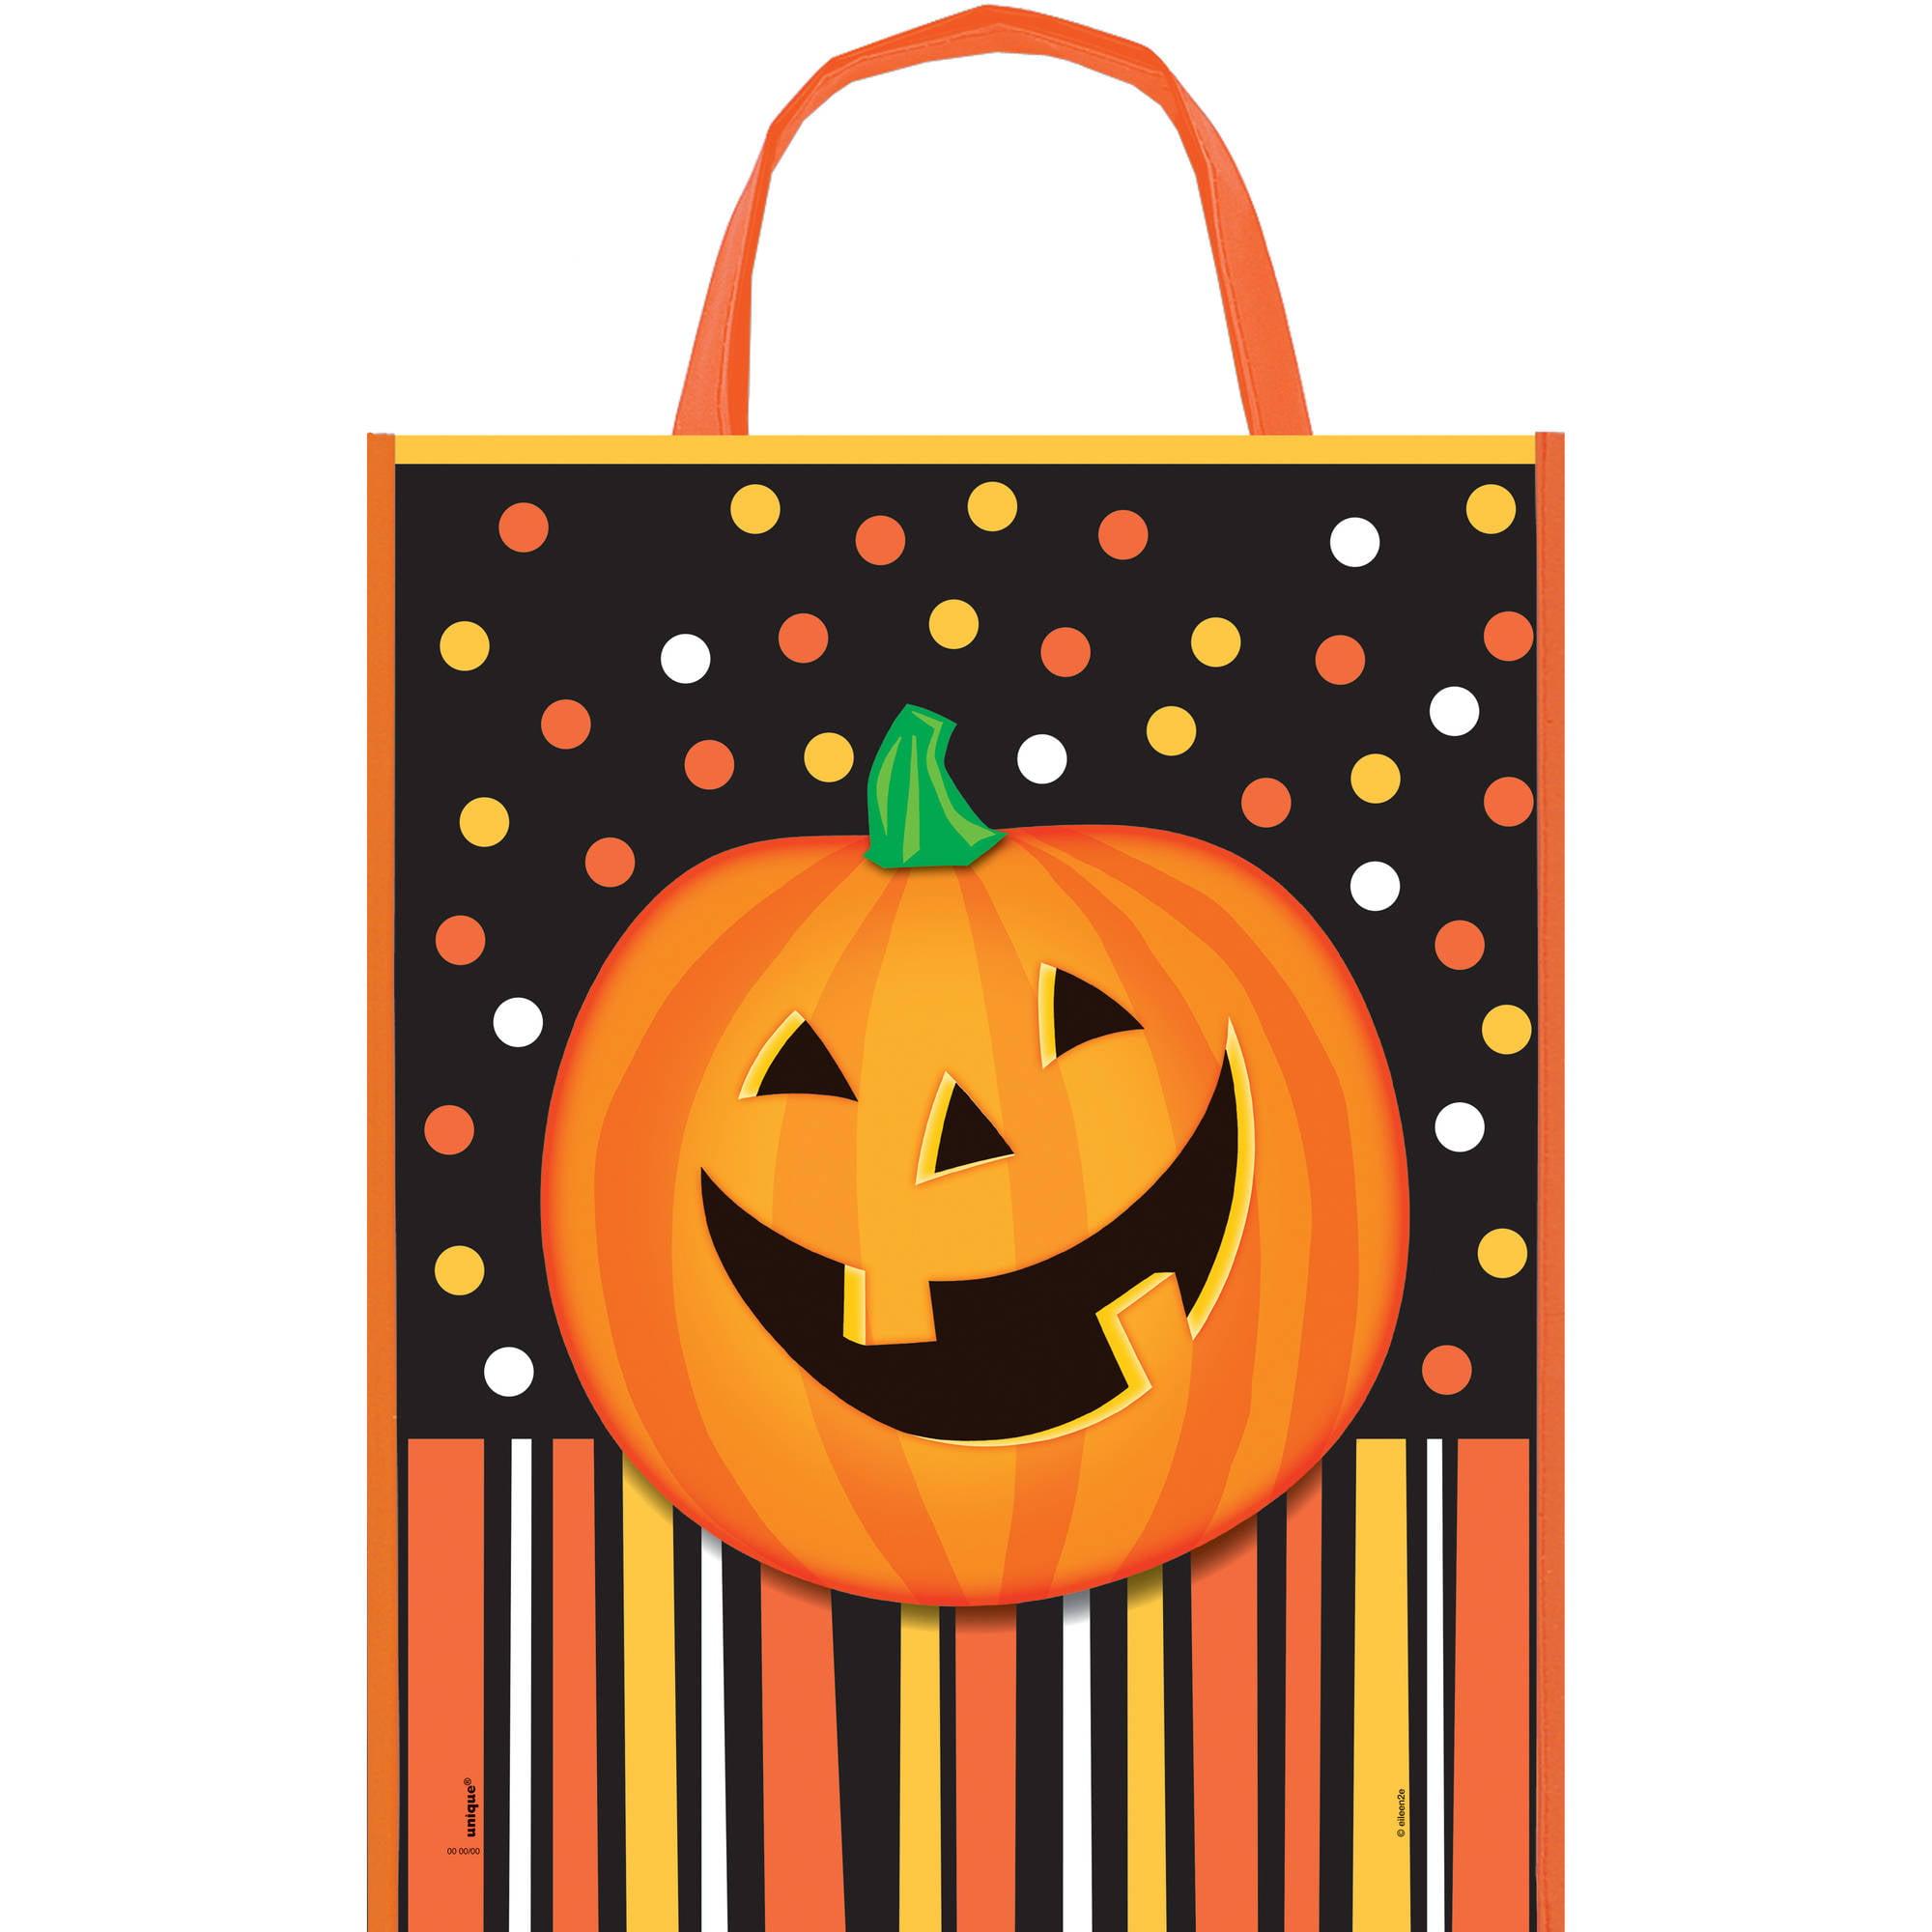 Large Plastic Smiling Pumpkin Halloween Goodie Bag, 15 x 12 in, 1ct